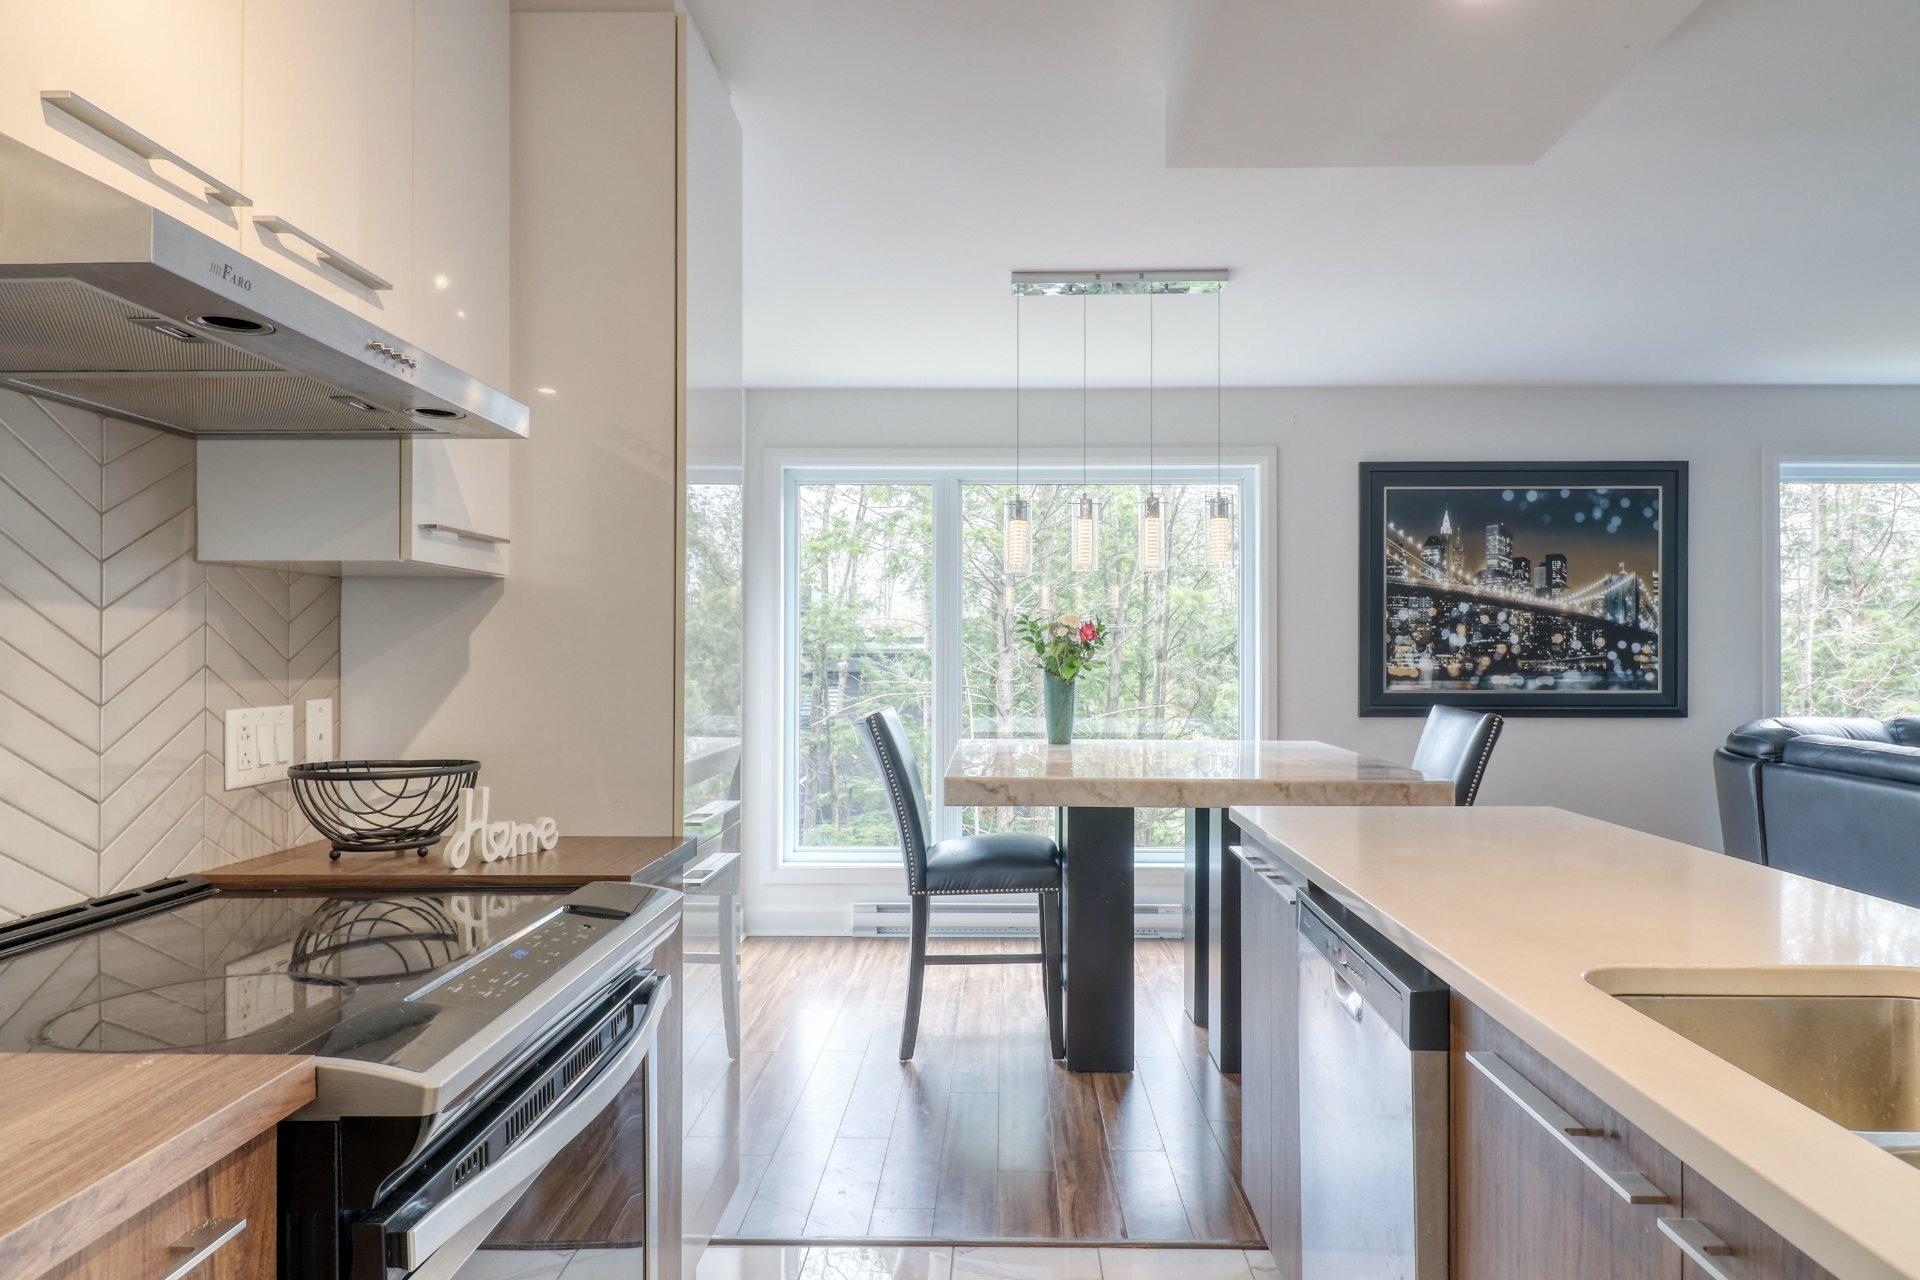 image 5 - Apartment For sale Blainville - 8 rooms